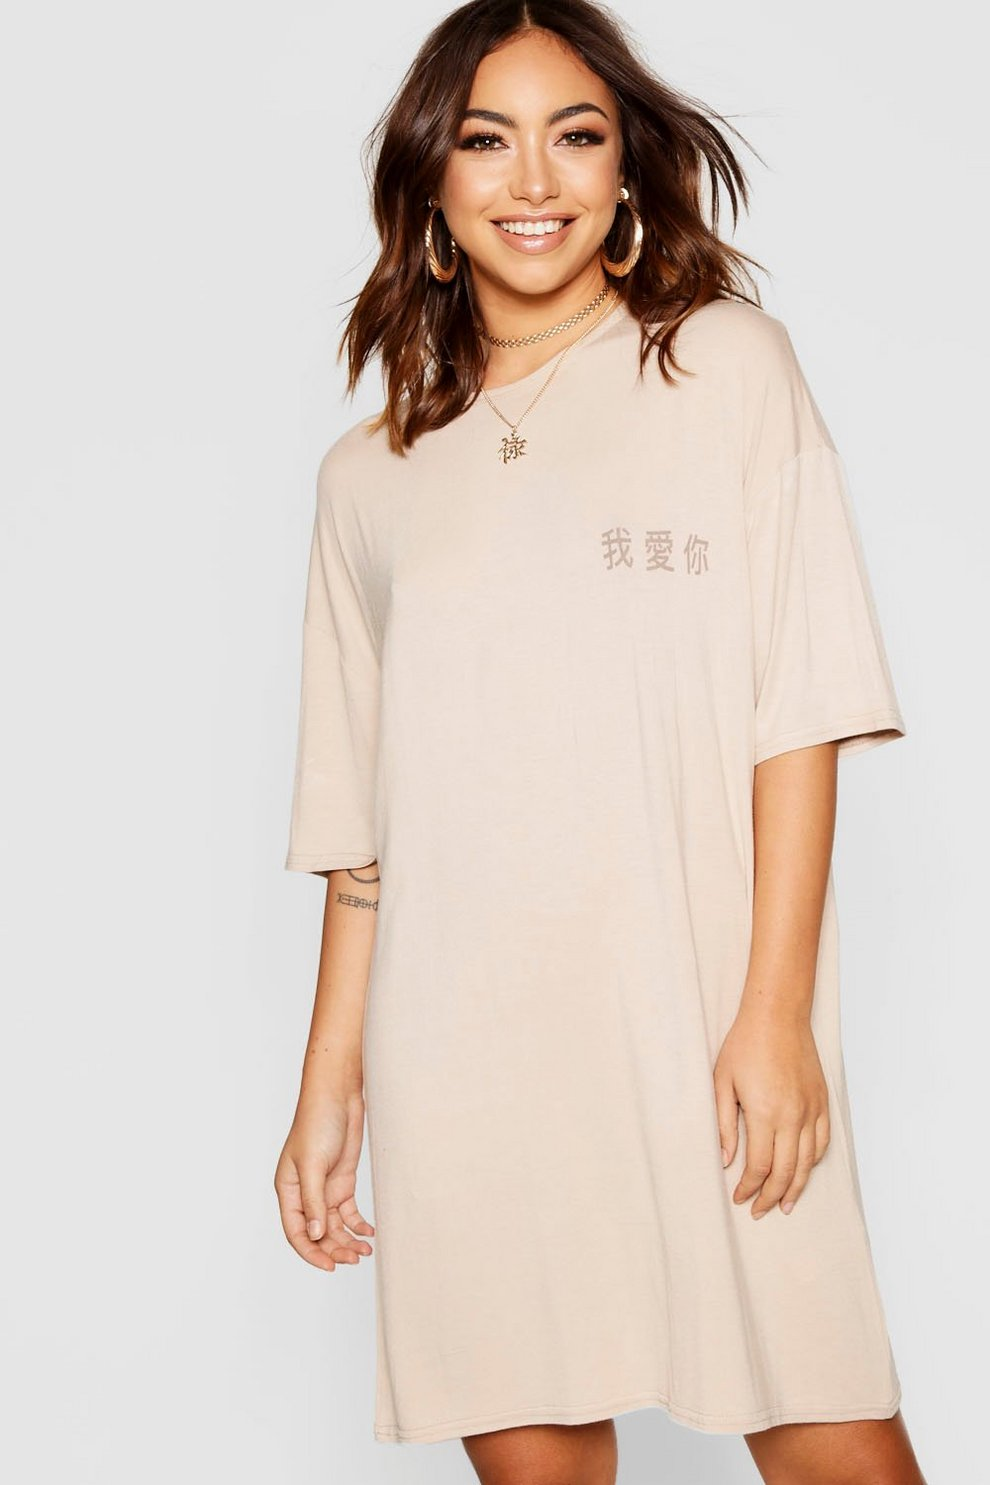 27a829349e1d Mini Chinese Slogan Oversized T-Shirt Dress